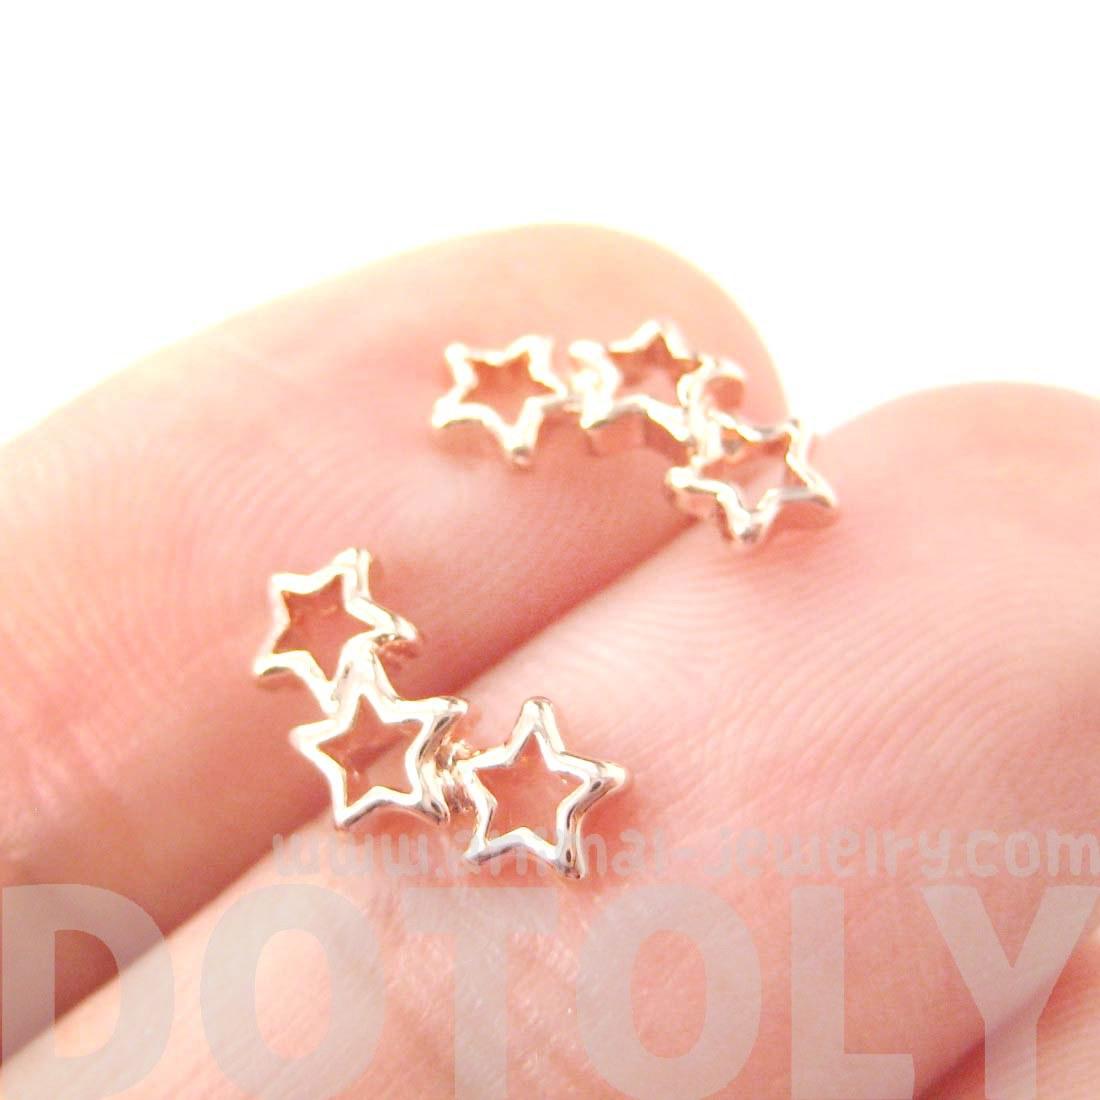 tiny little stars porn